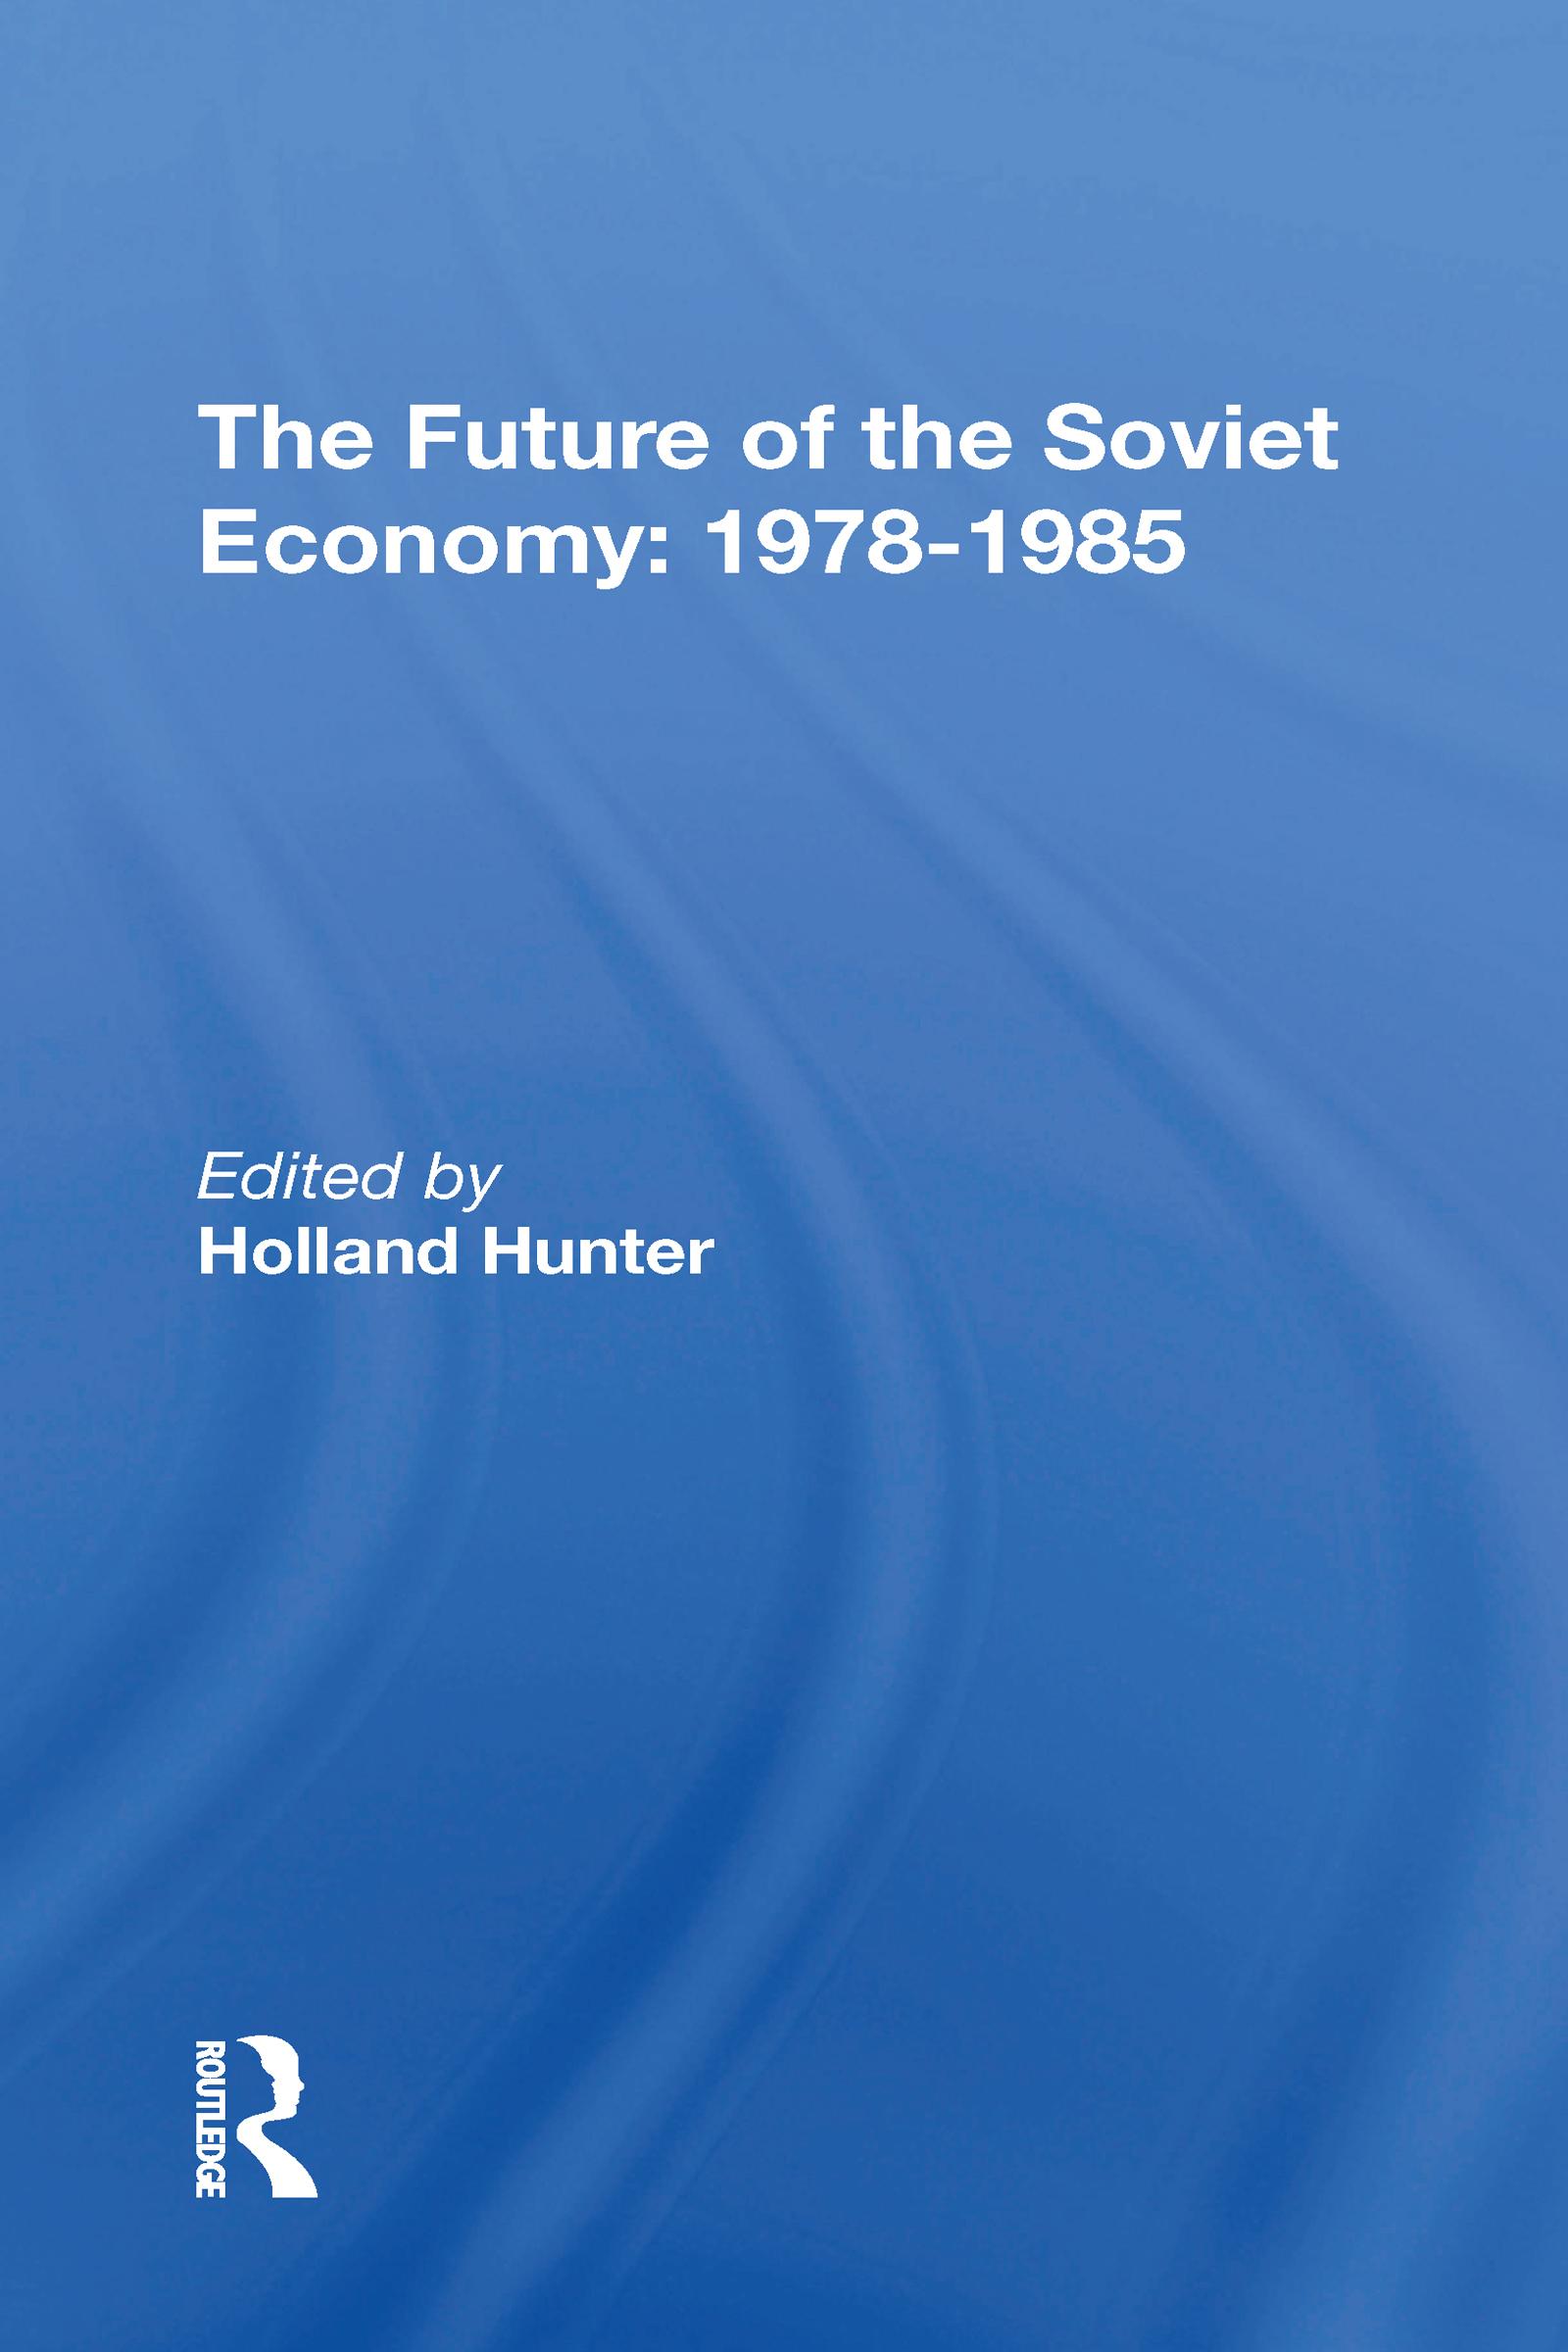 The Future Of The Soviet Economy: 1978-1985